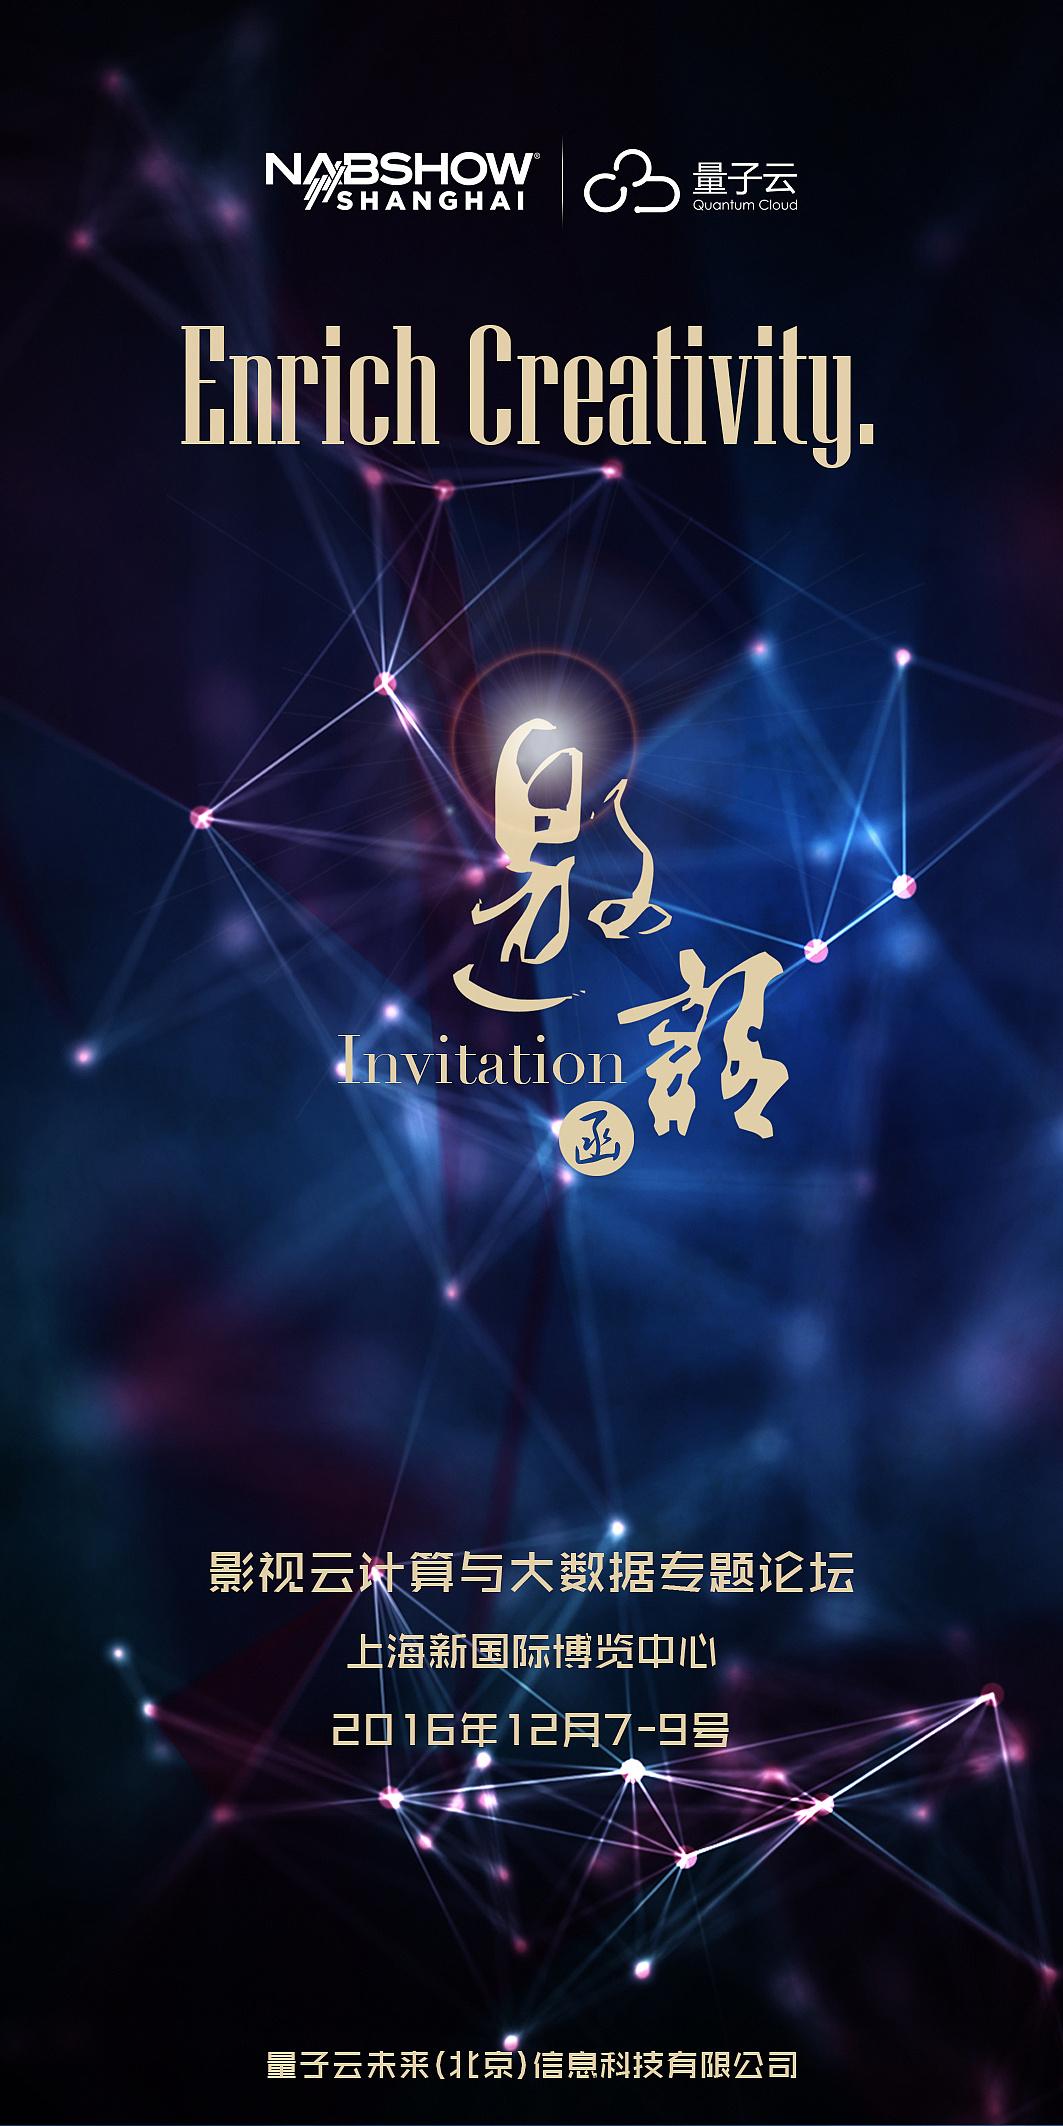 nab show shanghai 发布会邀请函图片